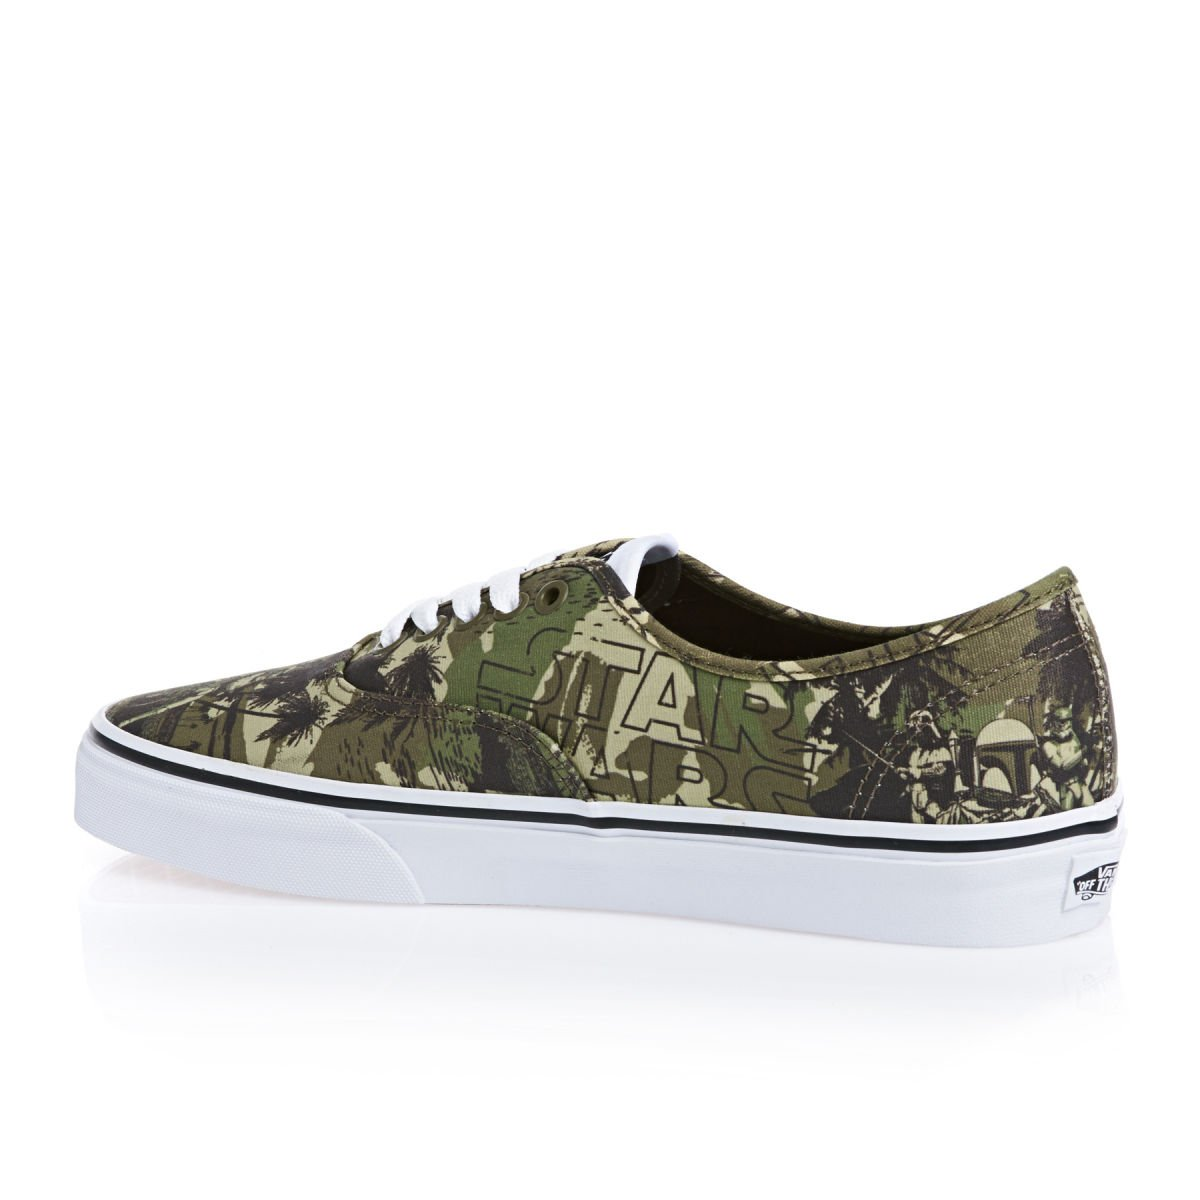 b1e353a74ecc8f Vans Star Wars Authentic Sneaker Boba Fett Camo 4 M US Men   5.5 M US  Women  Amazon.ca  Shoes   Handbags